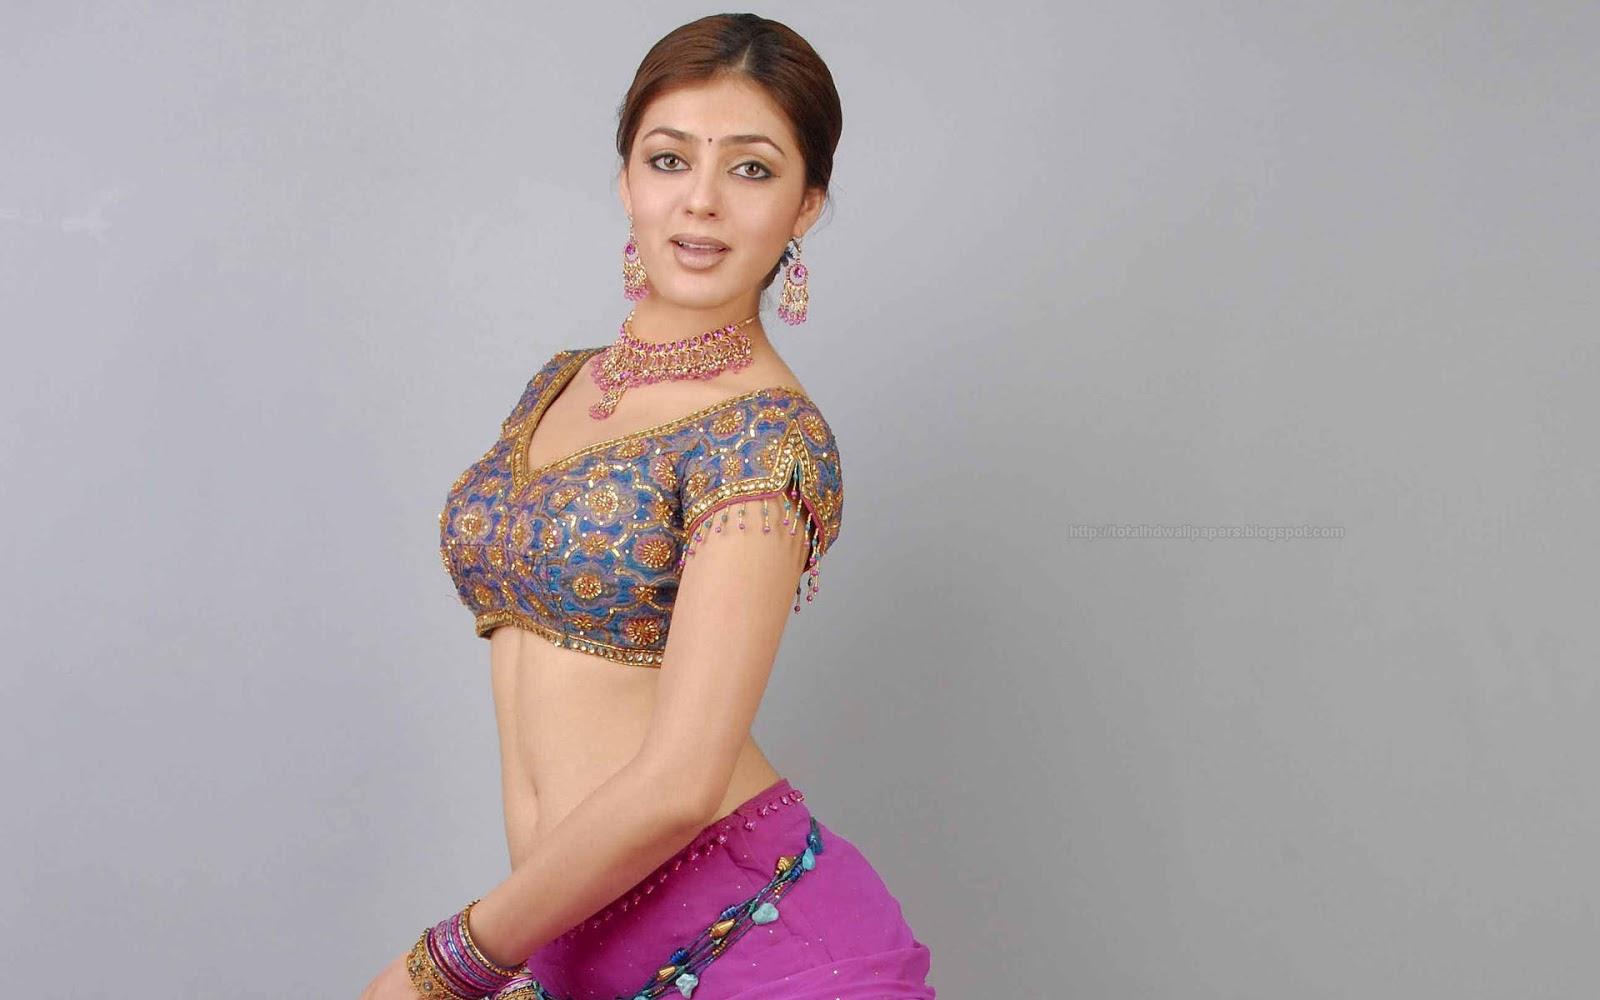 Parvathi Melton s Profile Galleries Wallpapers Movies News - parvati melton hd quality wallpapers